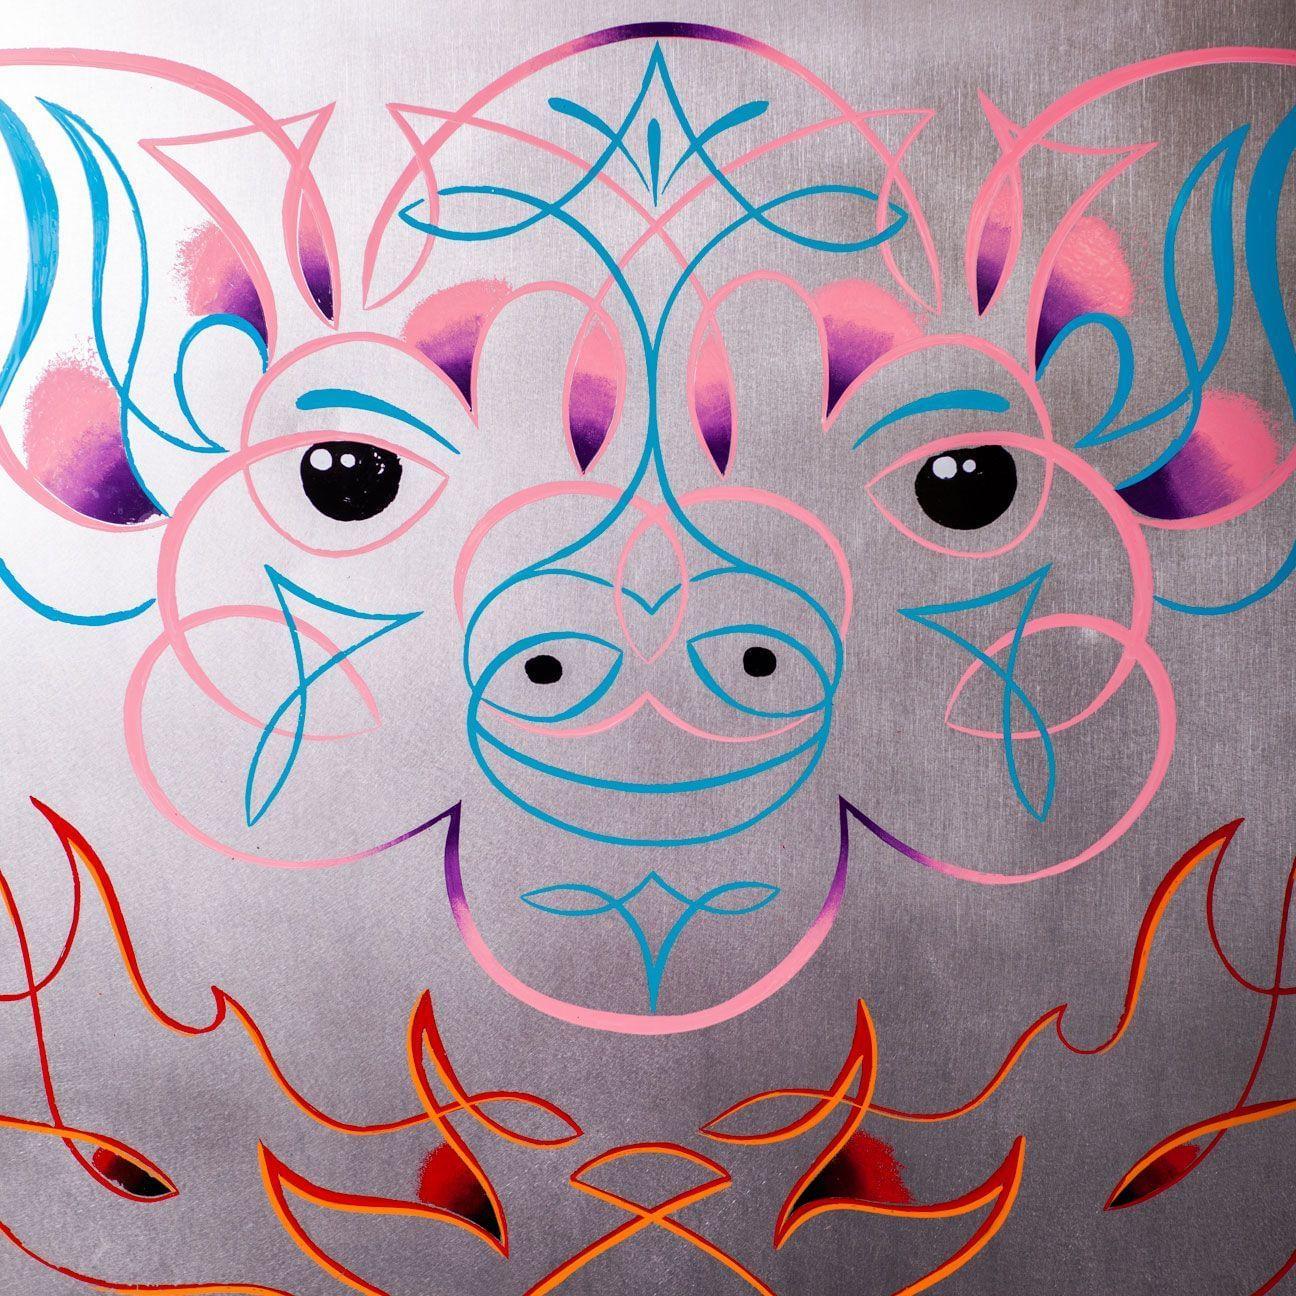 el Salchichero Painted Pig